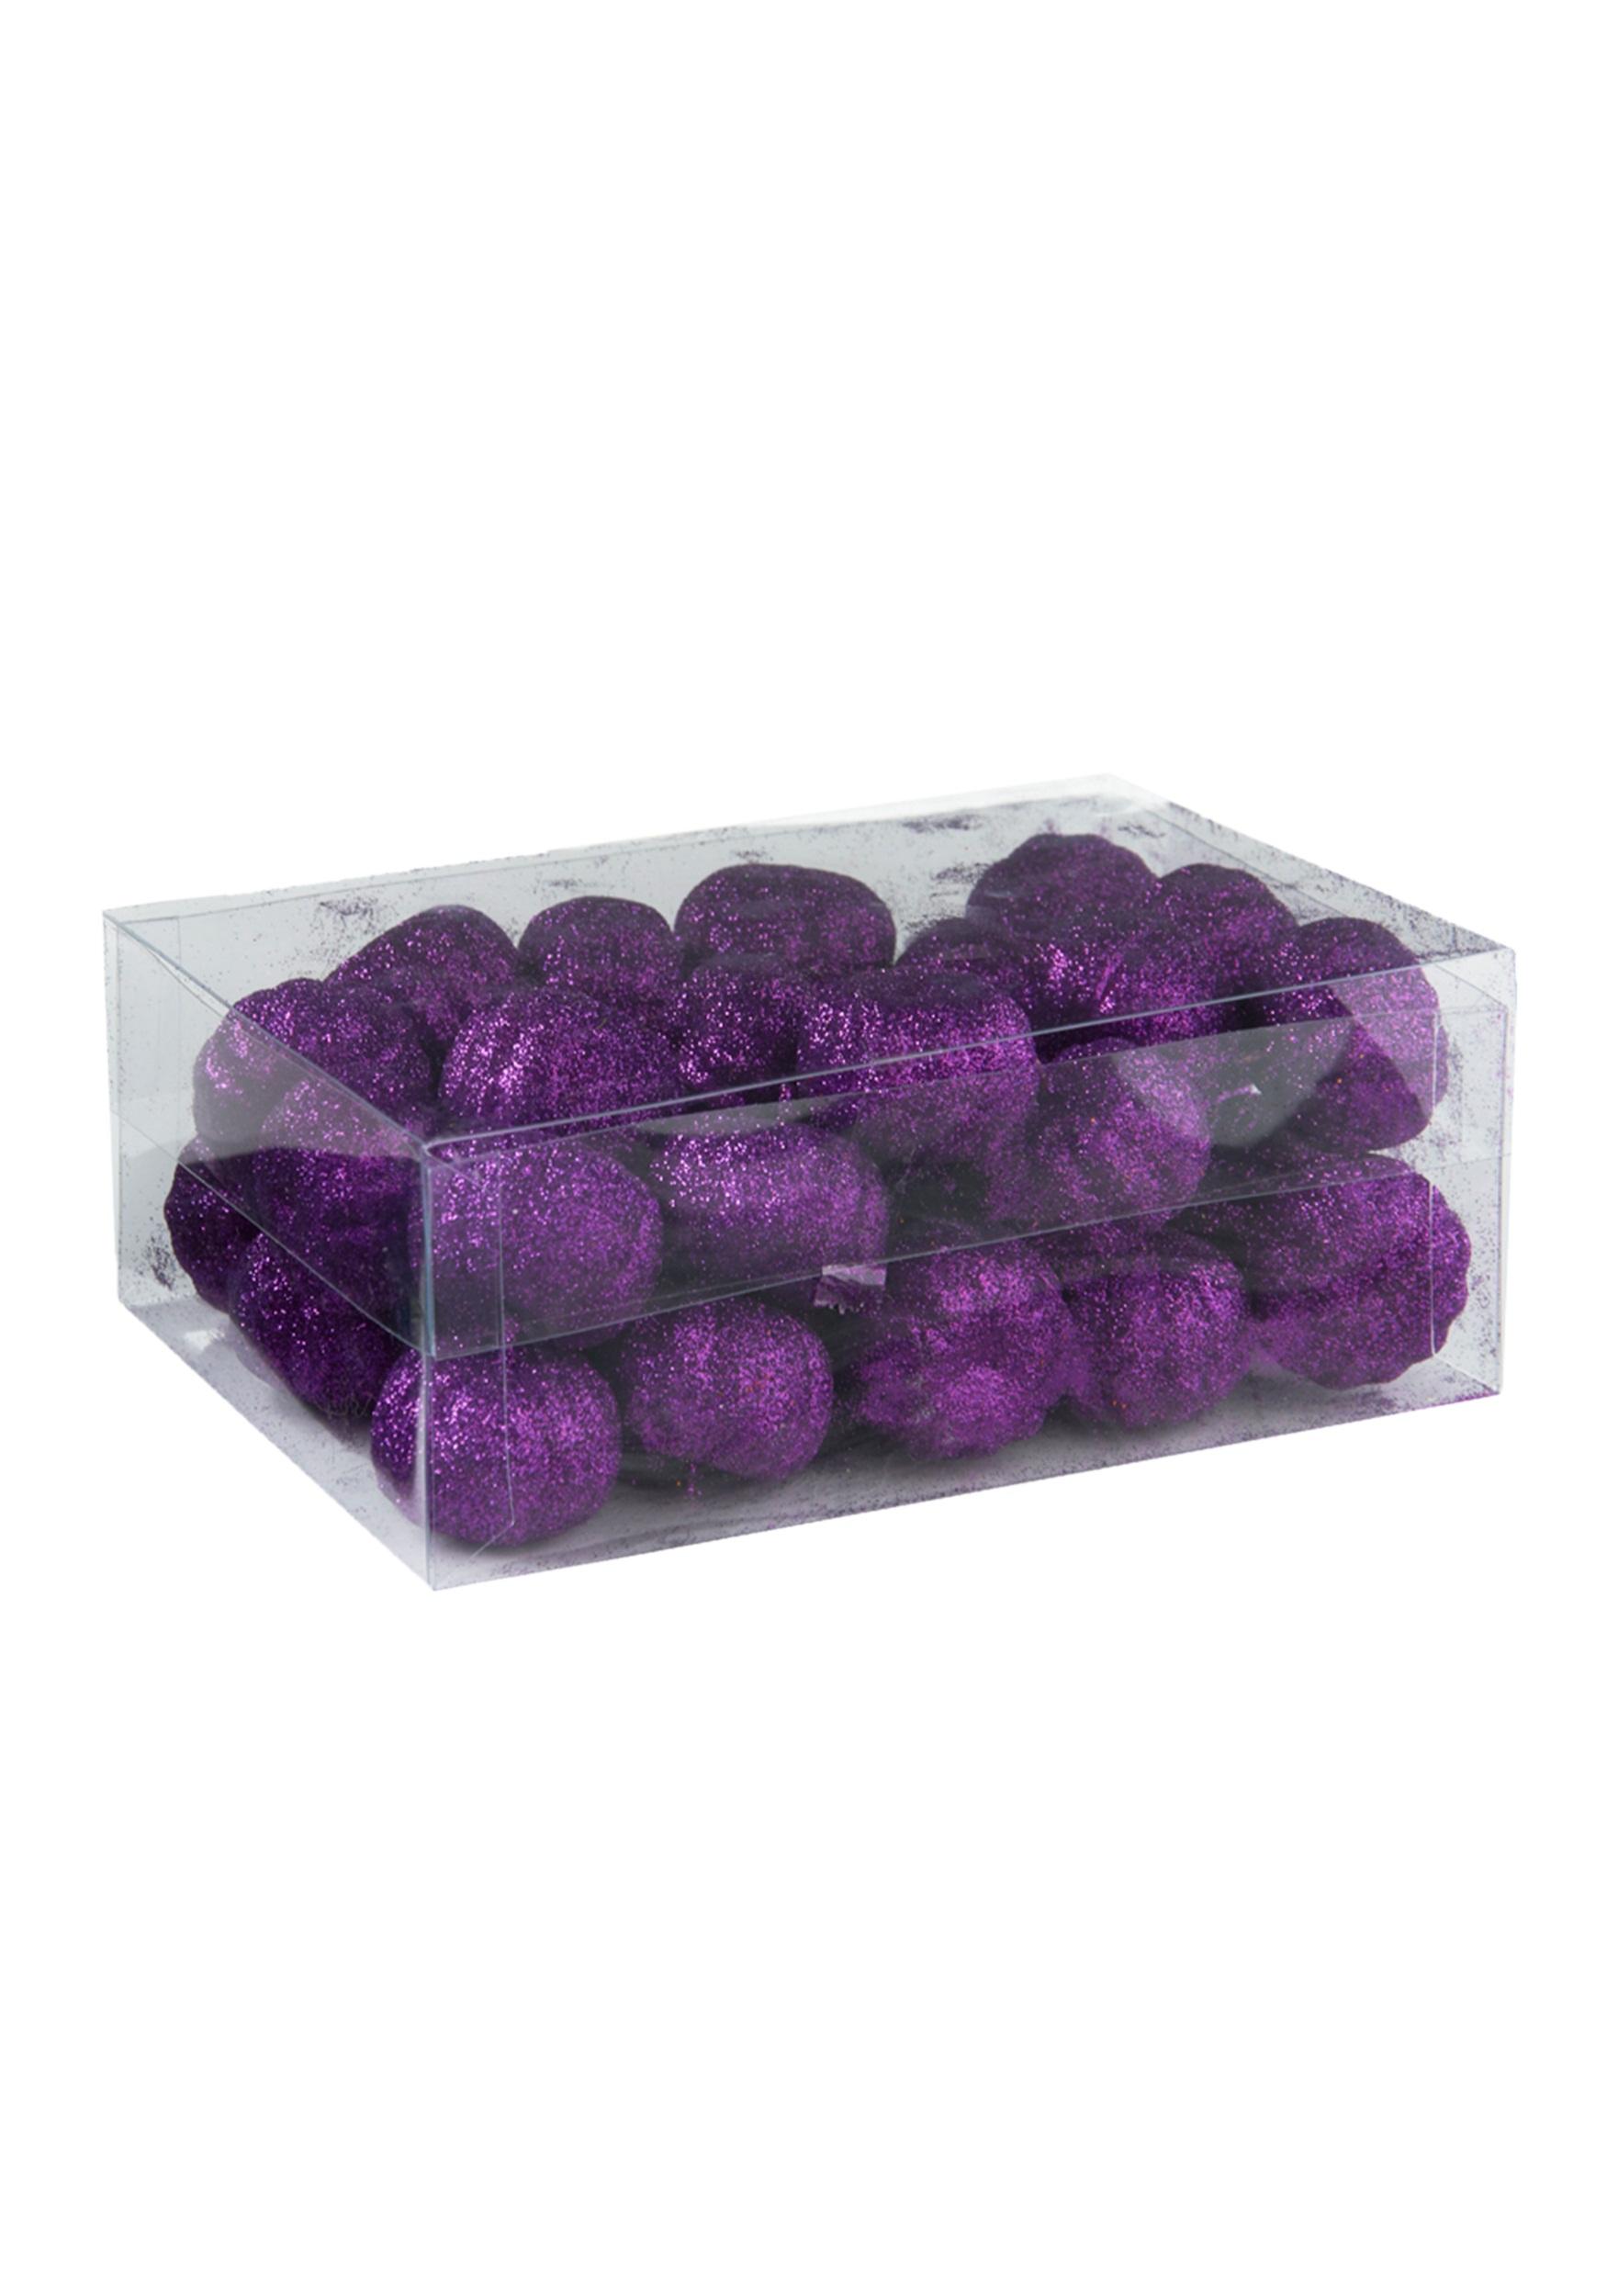 36 Piece Fall Winter Capsule Wardrobe: 36 Piece Purple Glitter Mini Pumpkins